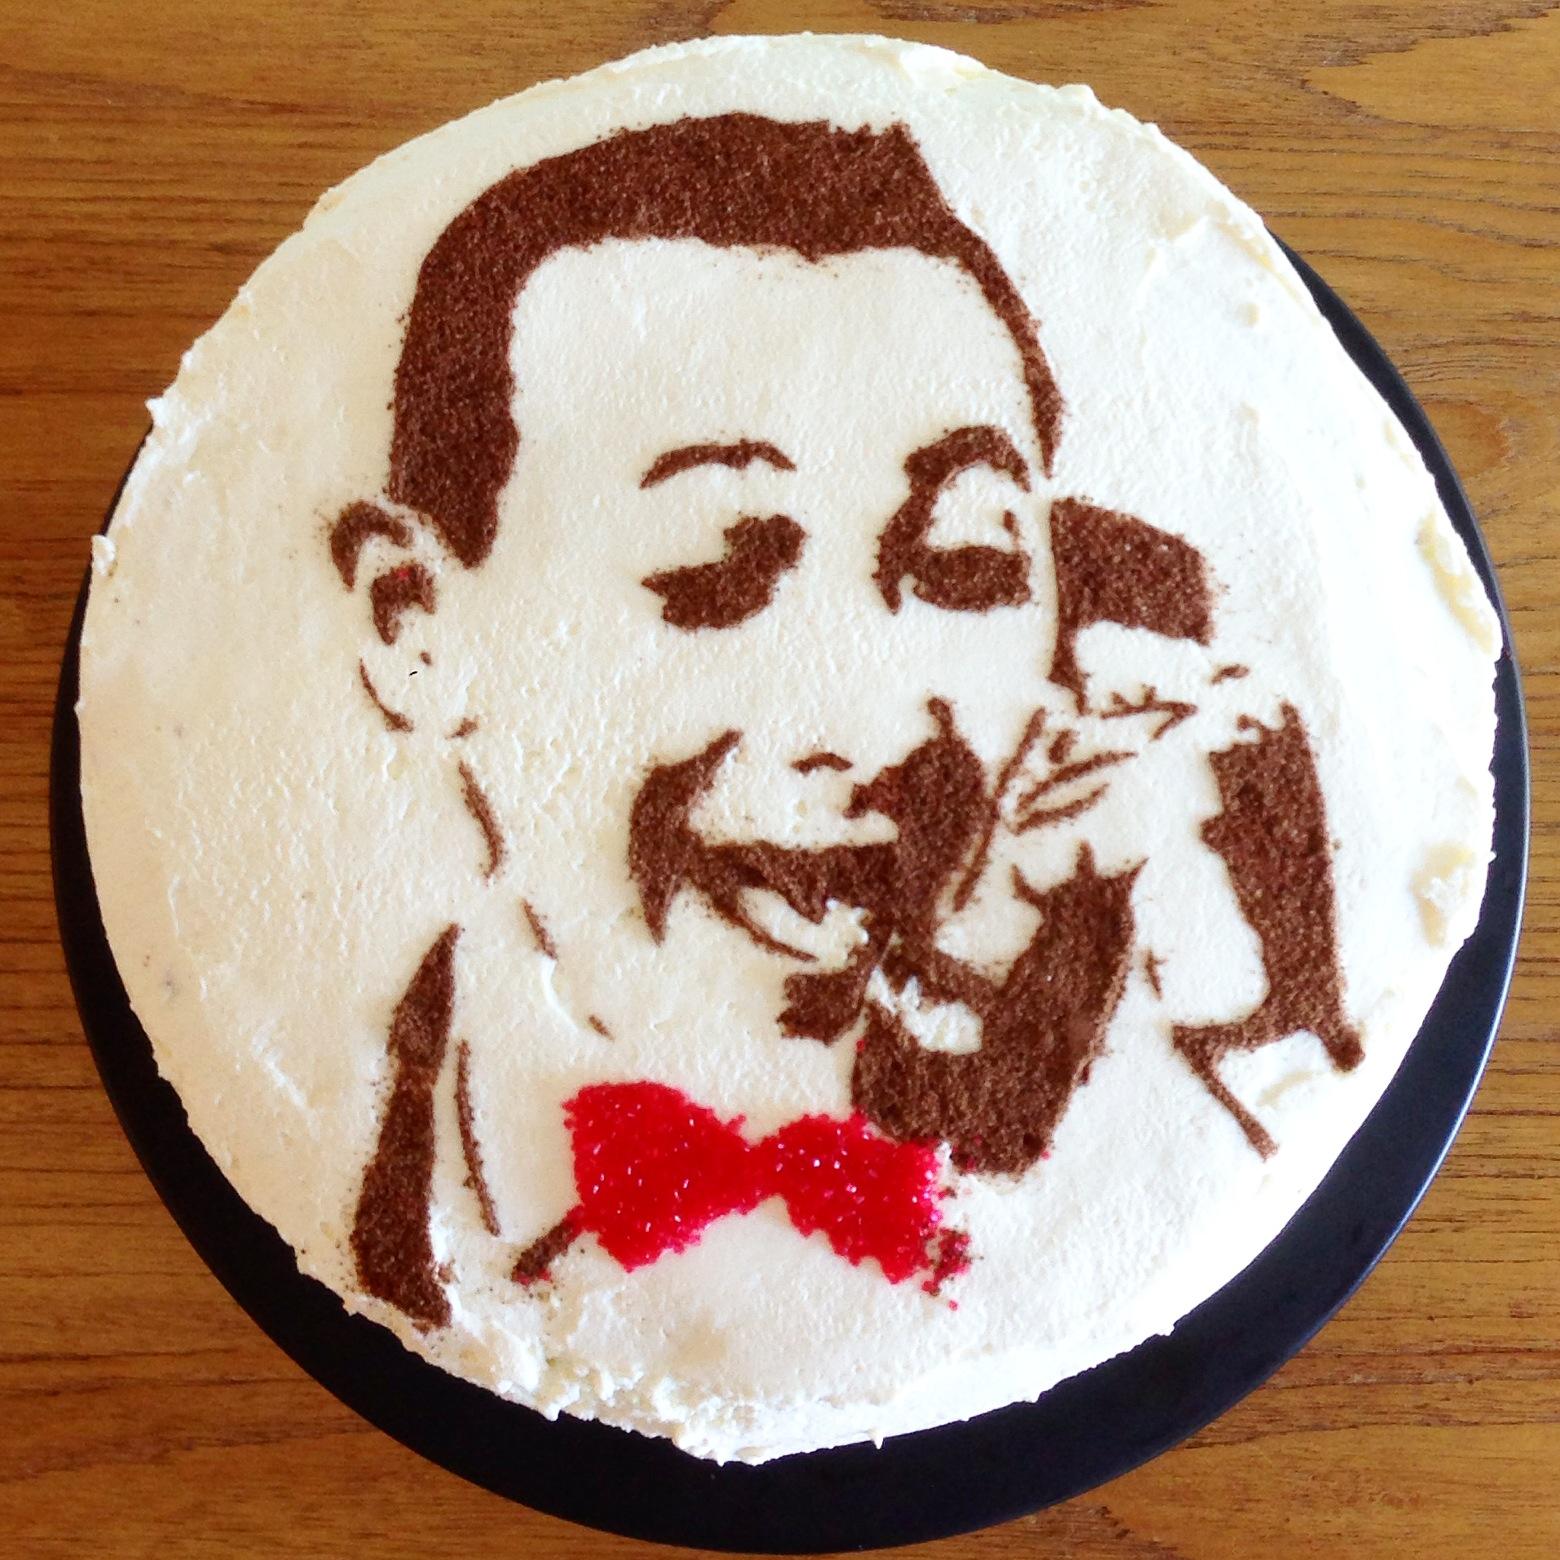 Pee-Wee cake